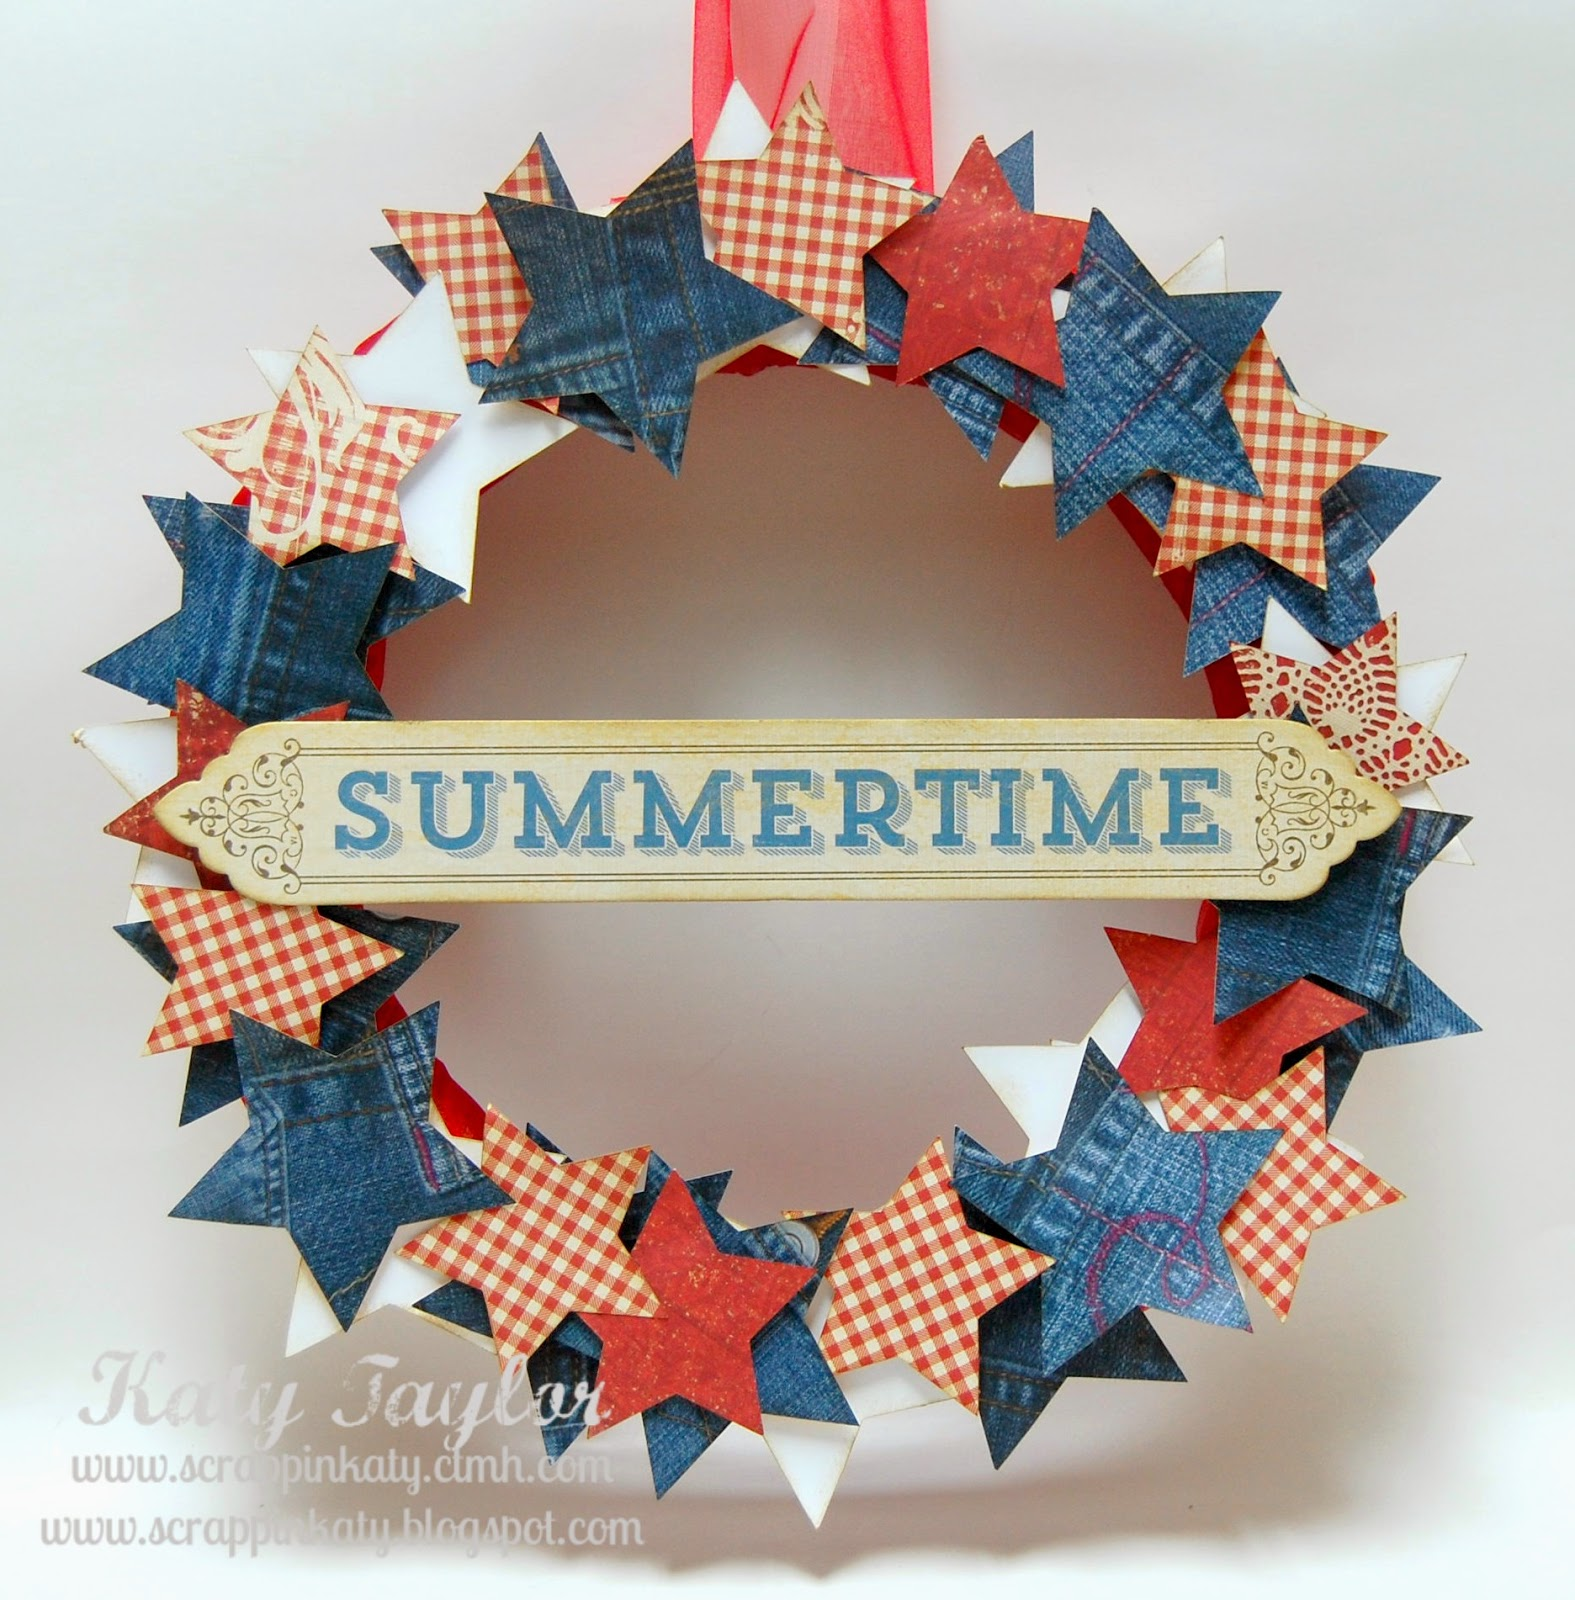 Summertime-Star-Wreath